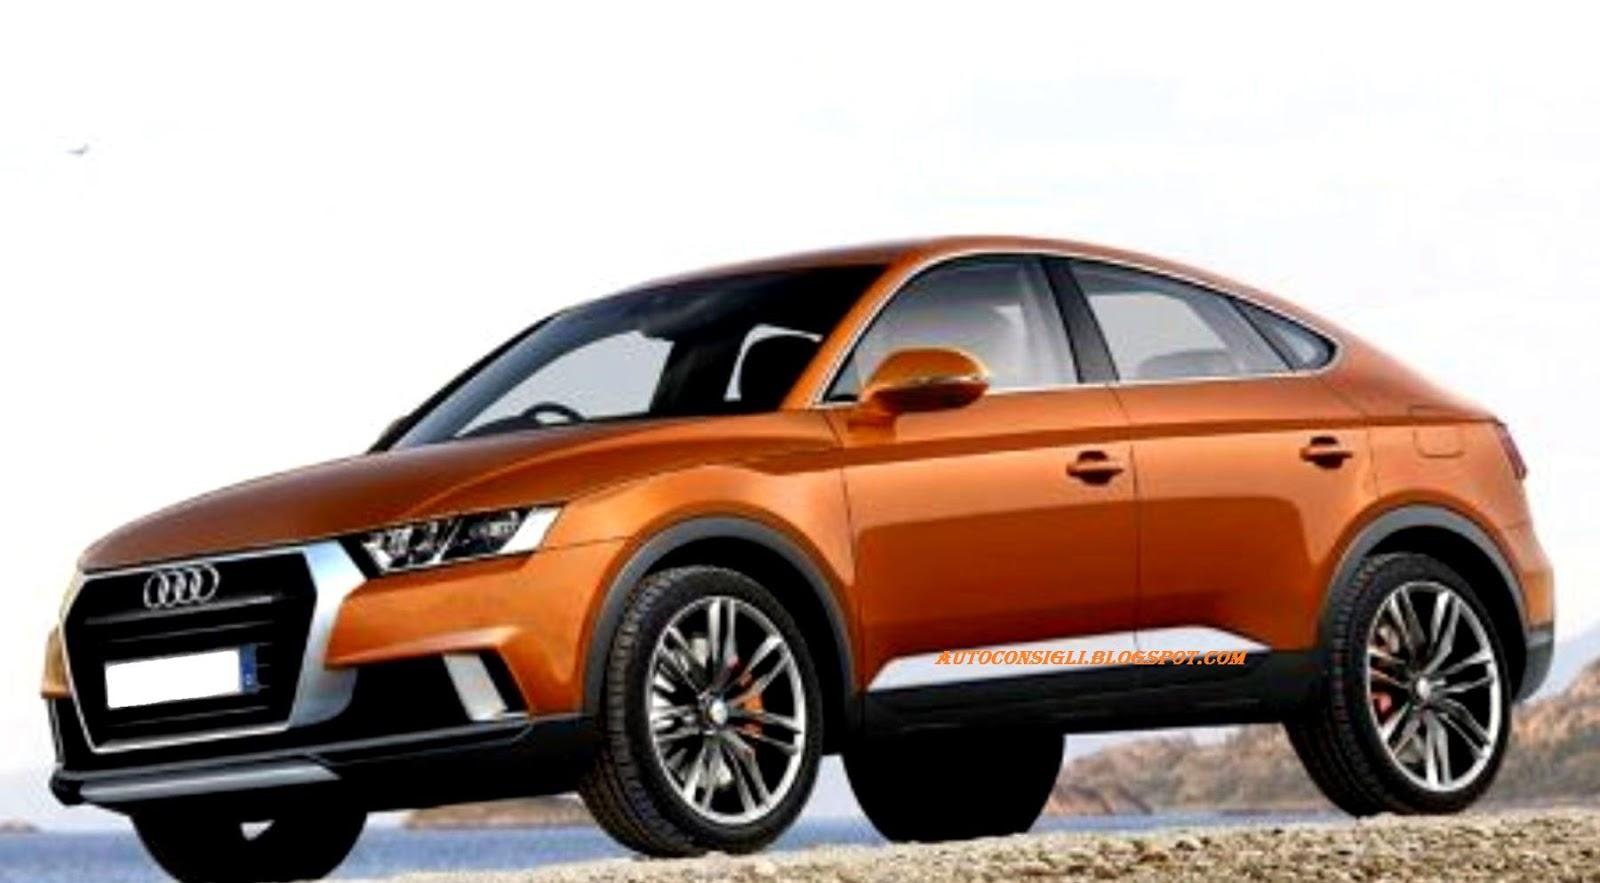 2015 Nissan Xterra 2015 Opel Vivaro 2015 Land Rover LR2 Review 2015